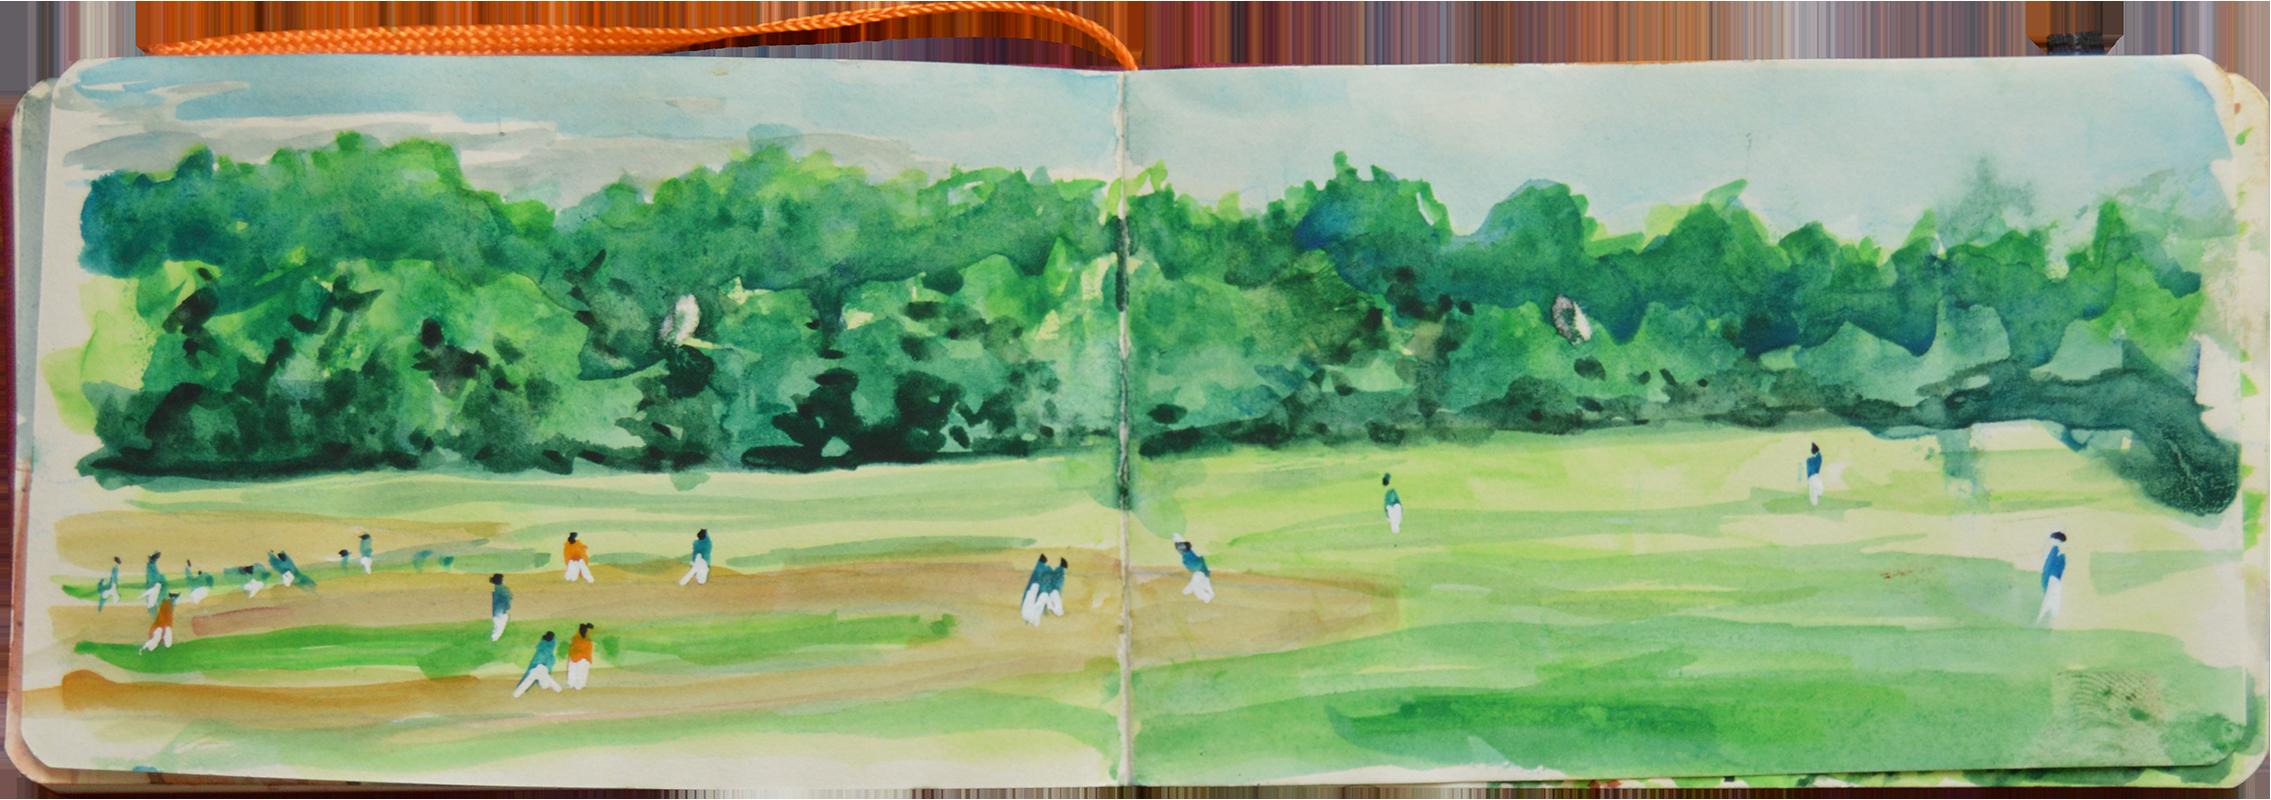 Sketchbook A 01